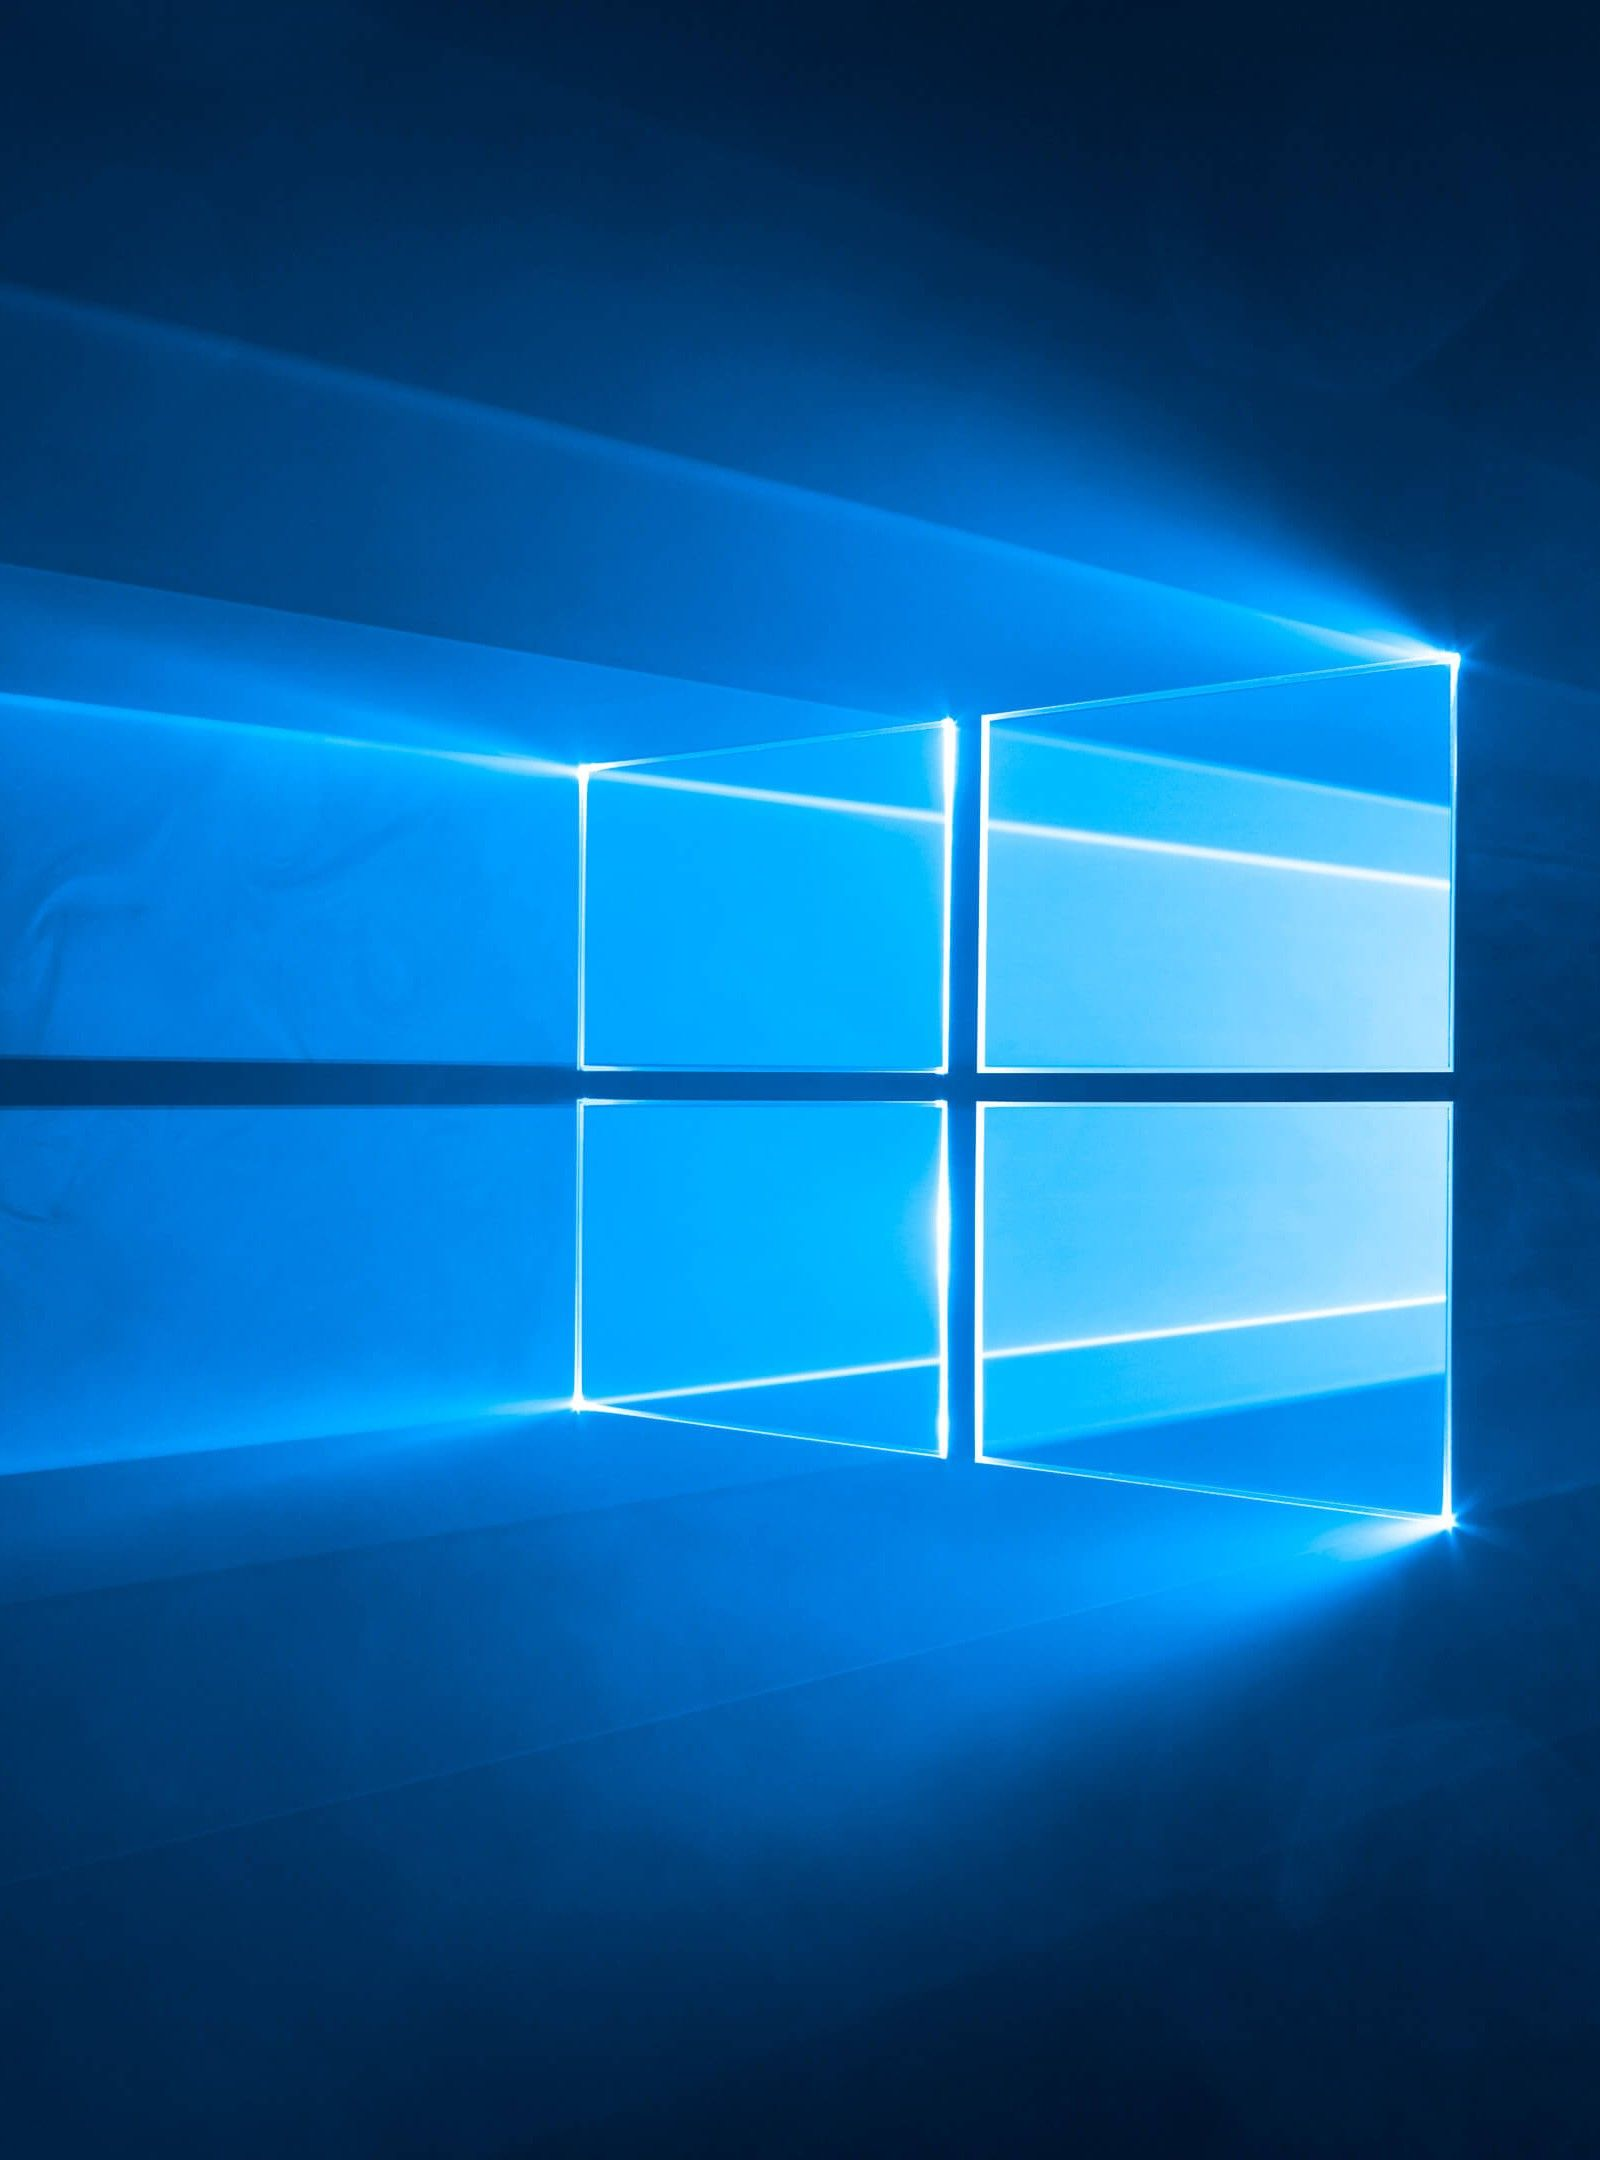 Kindle Fire Hd Wallpaper Windows 10 Microsoft Windows Windows Defender